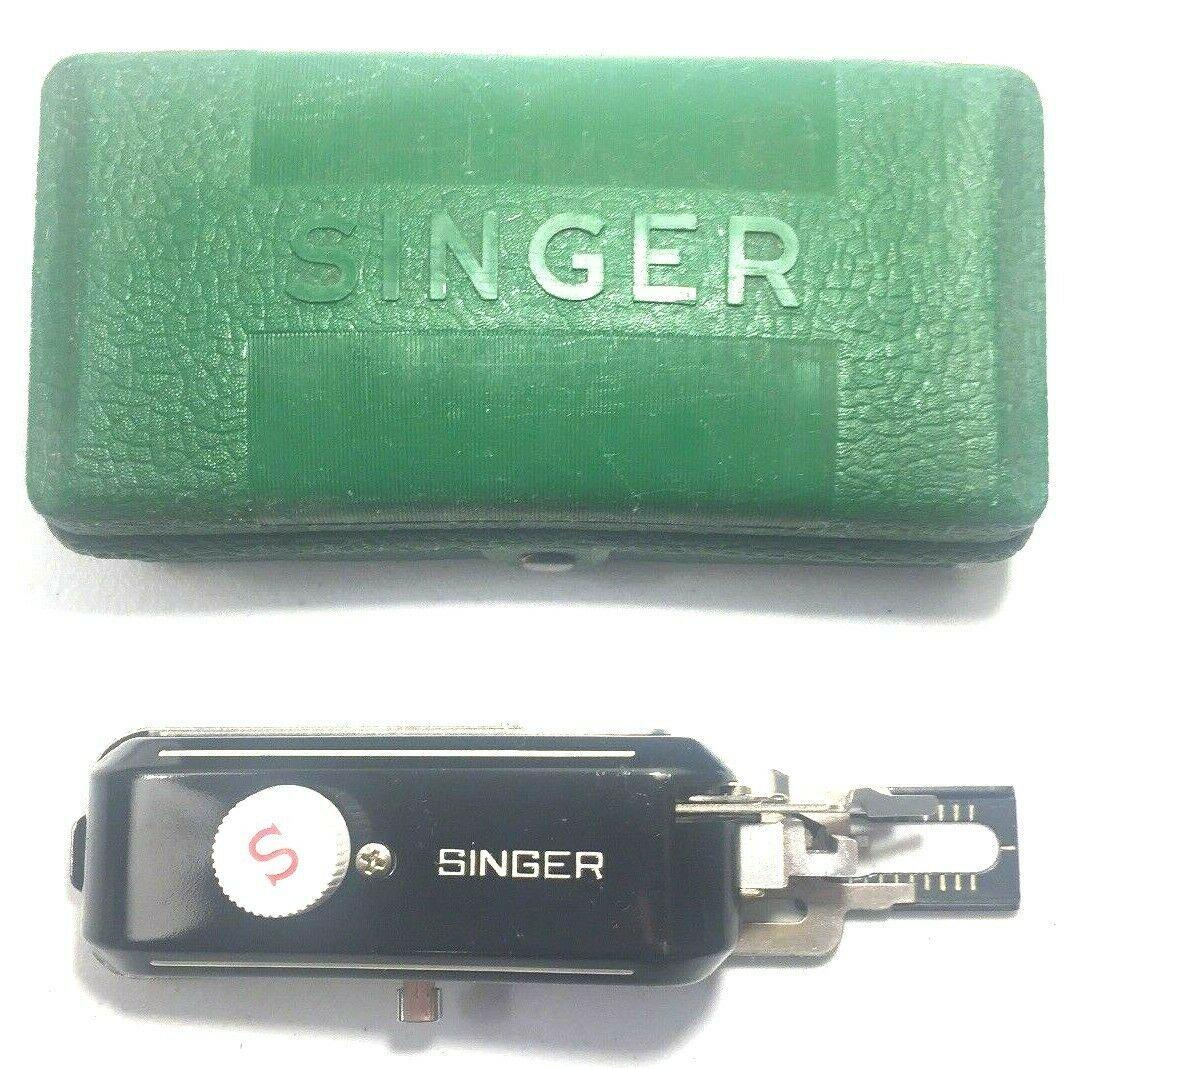 Vintage Singer Sewing Machine Attachment Buttonholer W654321N + 3 Templates - $4.90